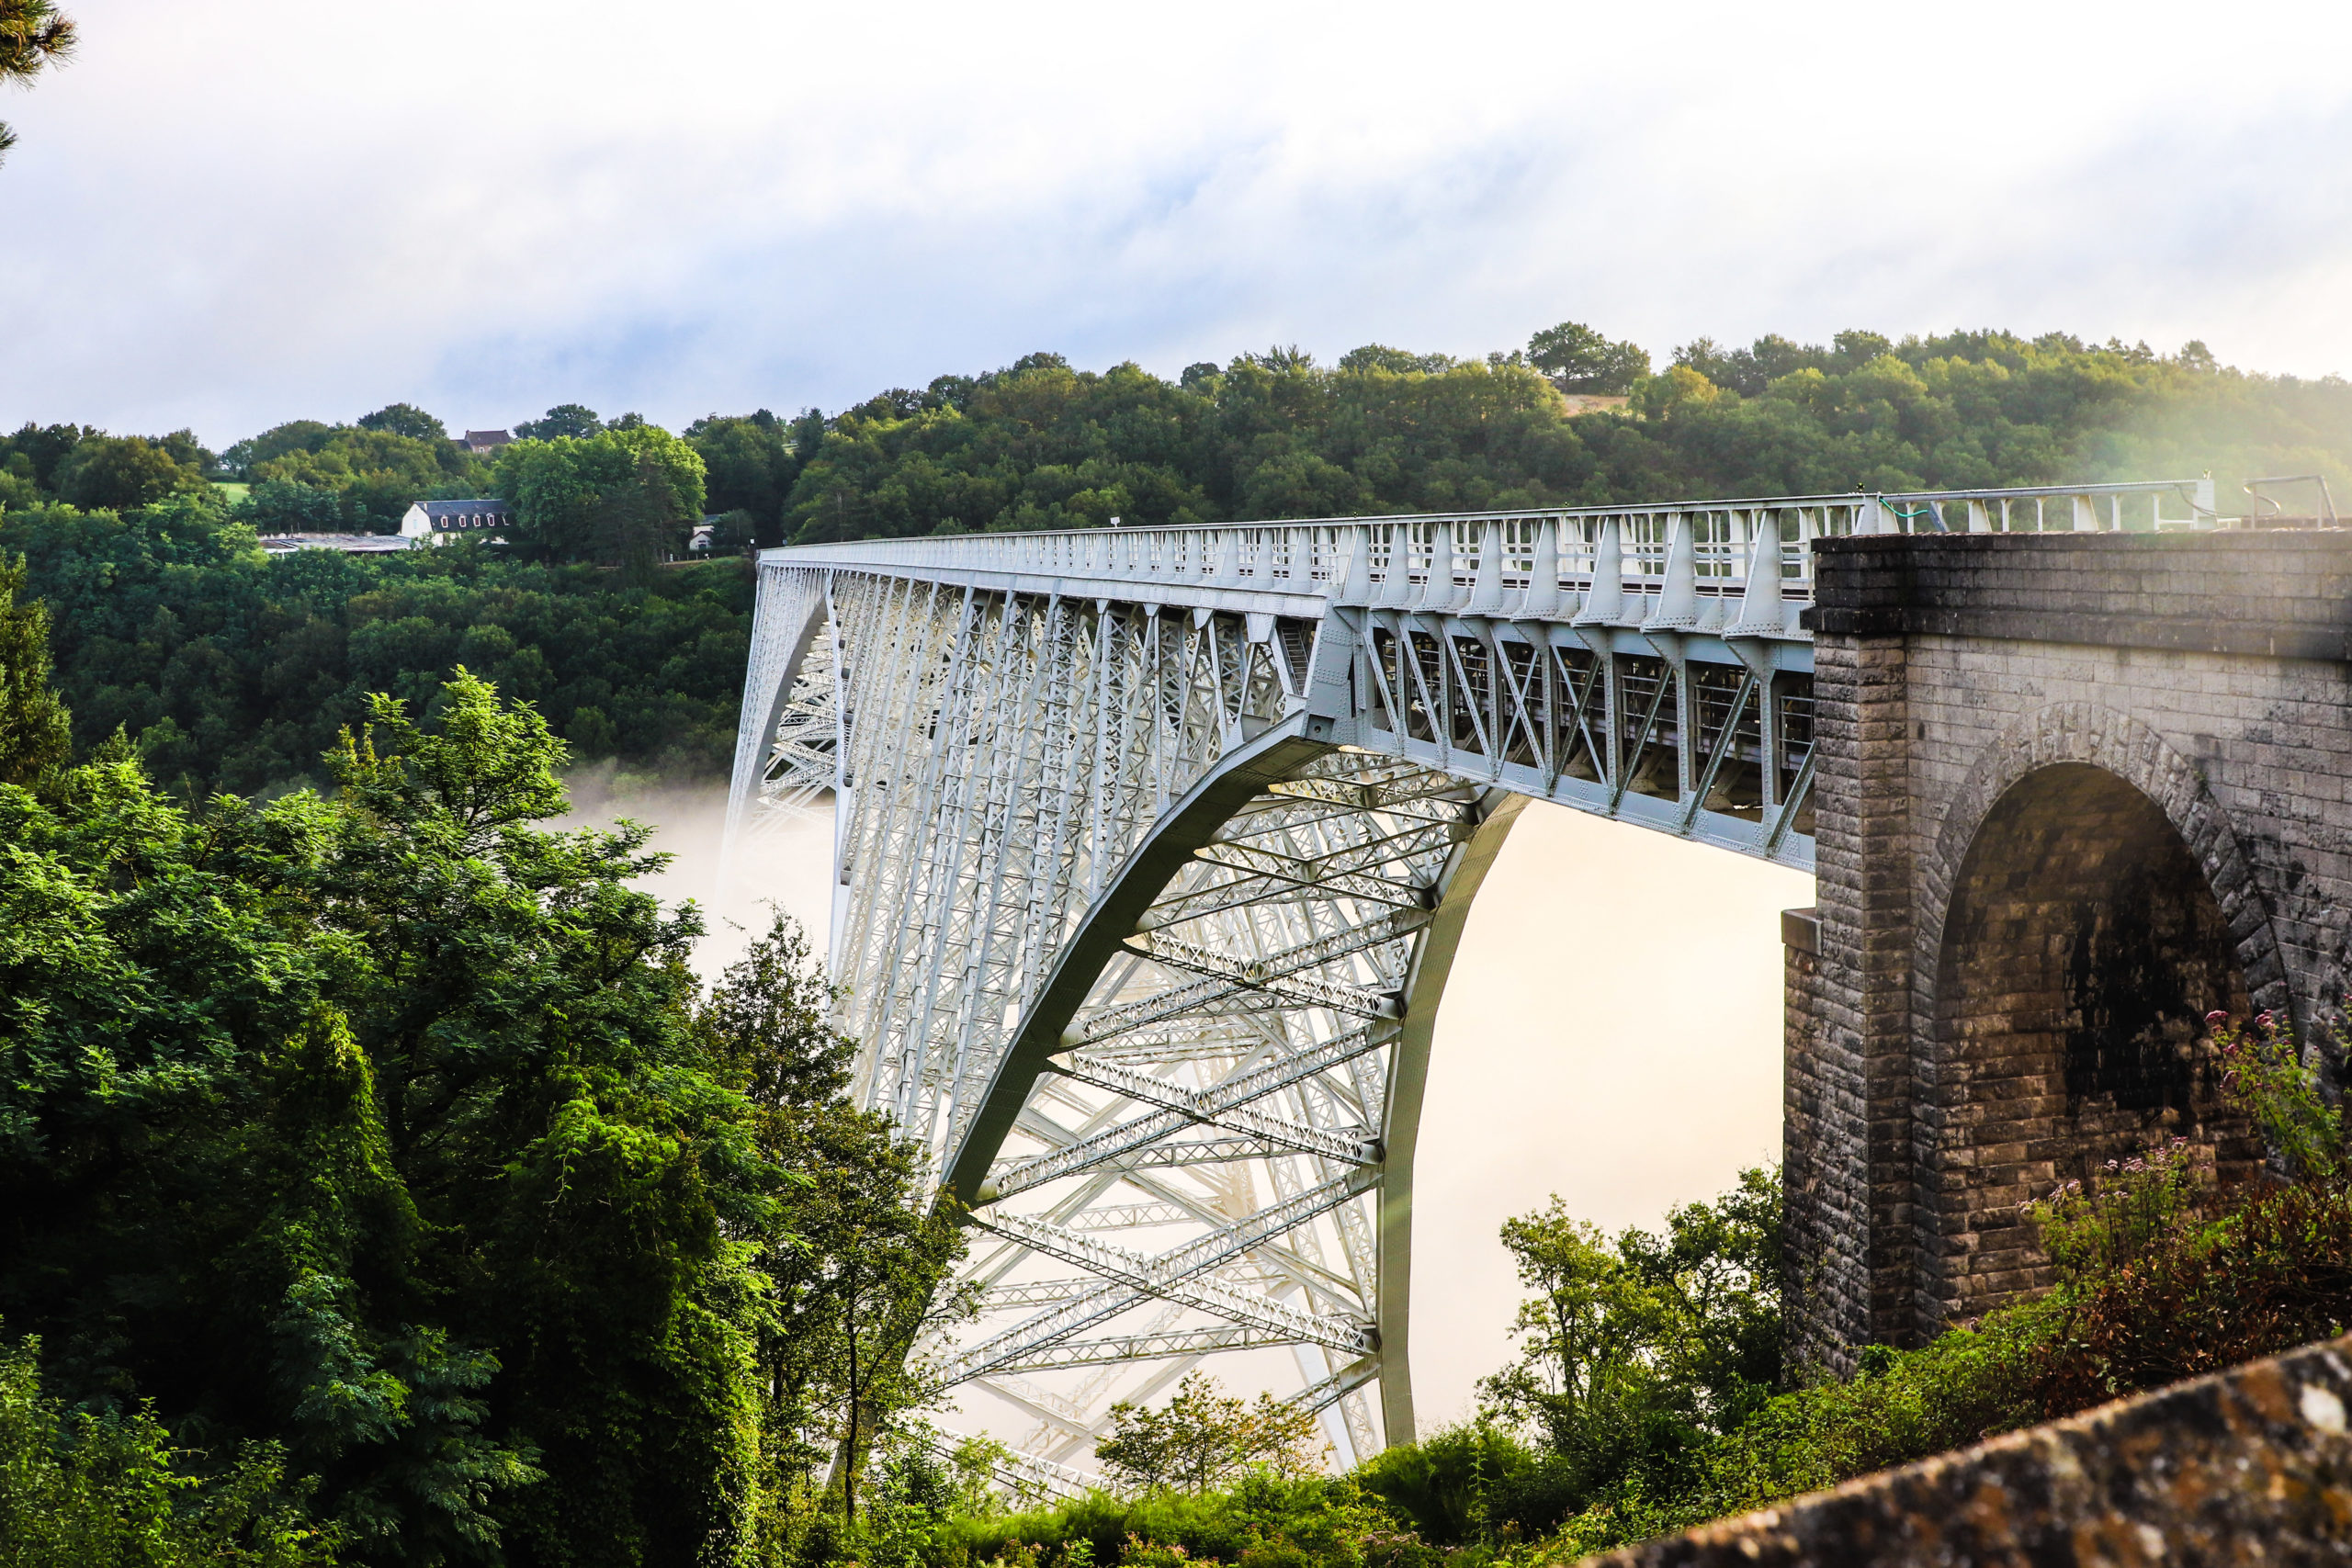 viaduc du Viaur - Vallée du Viaur - Tarn tourisme